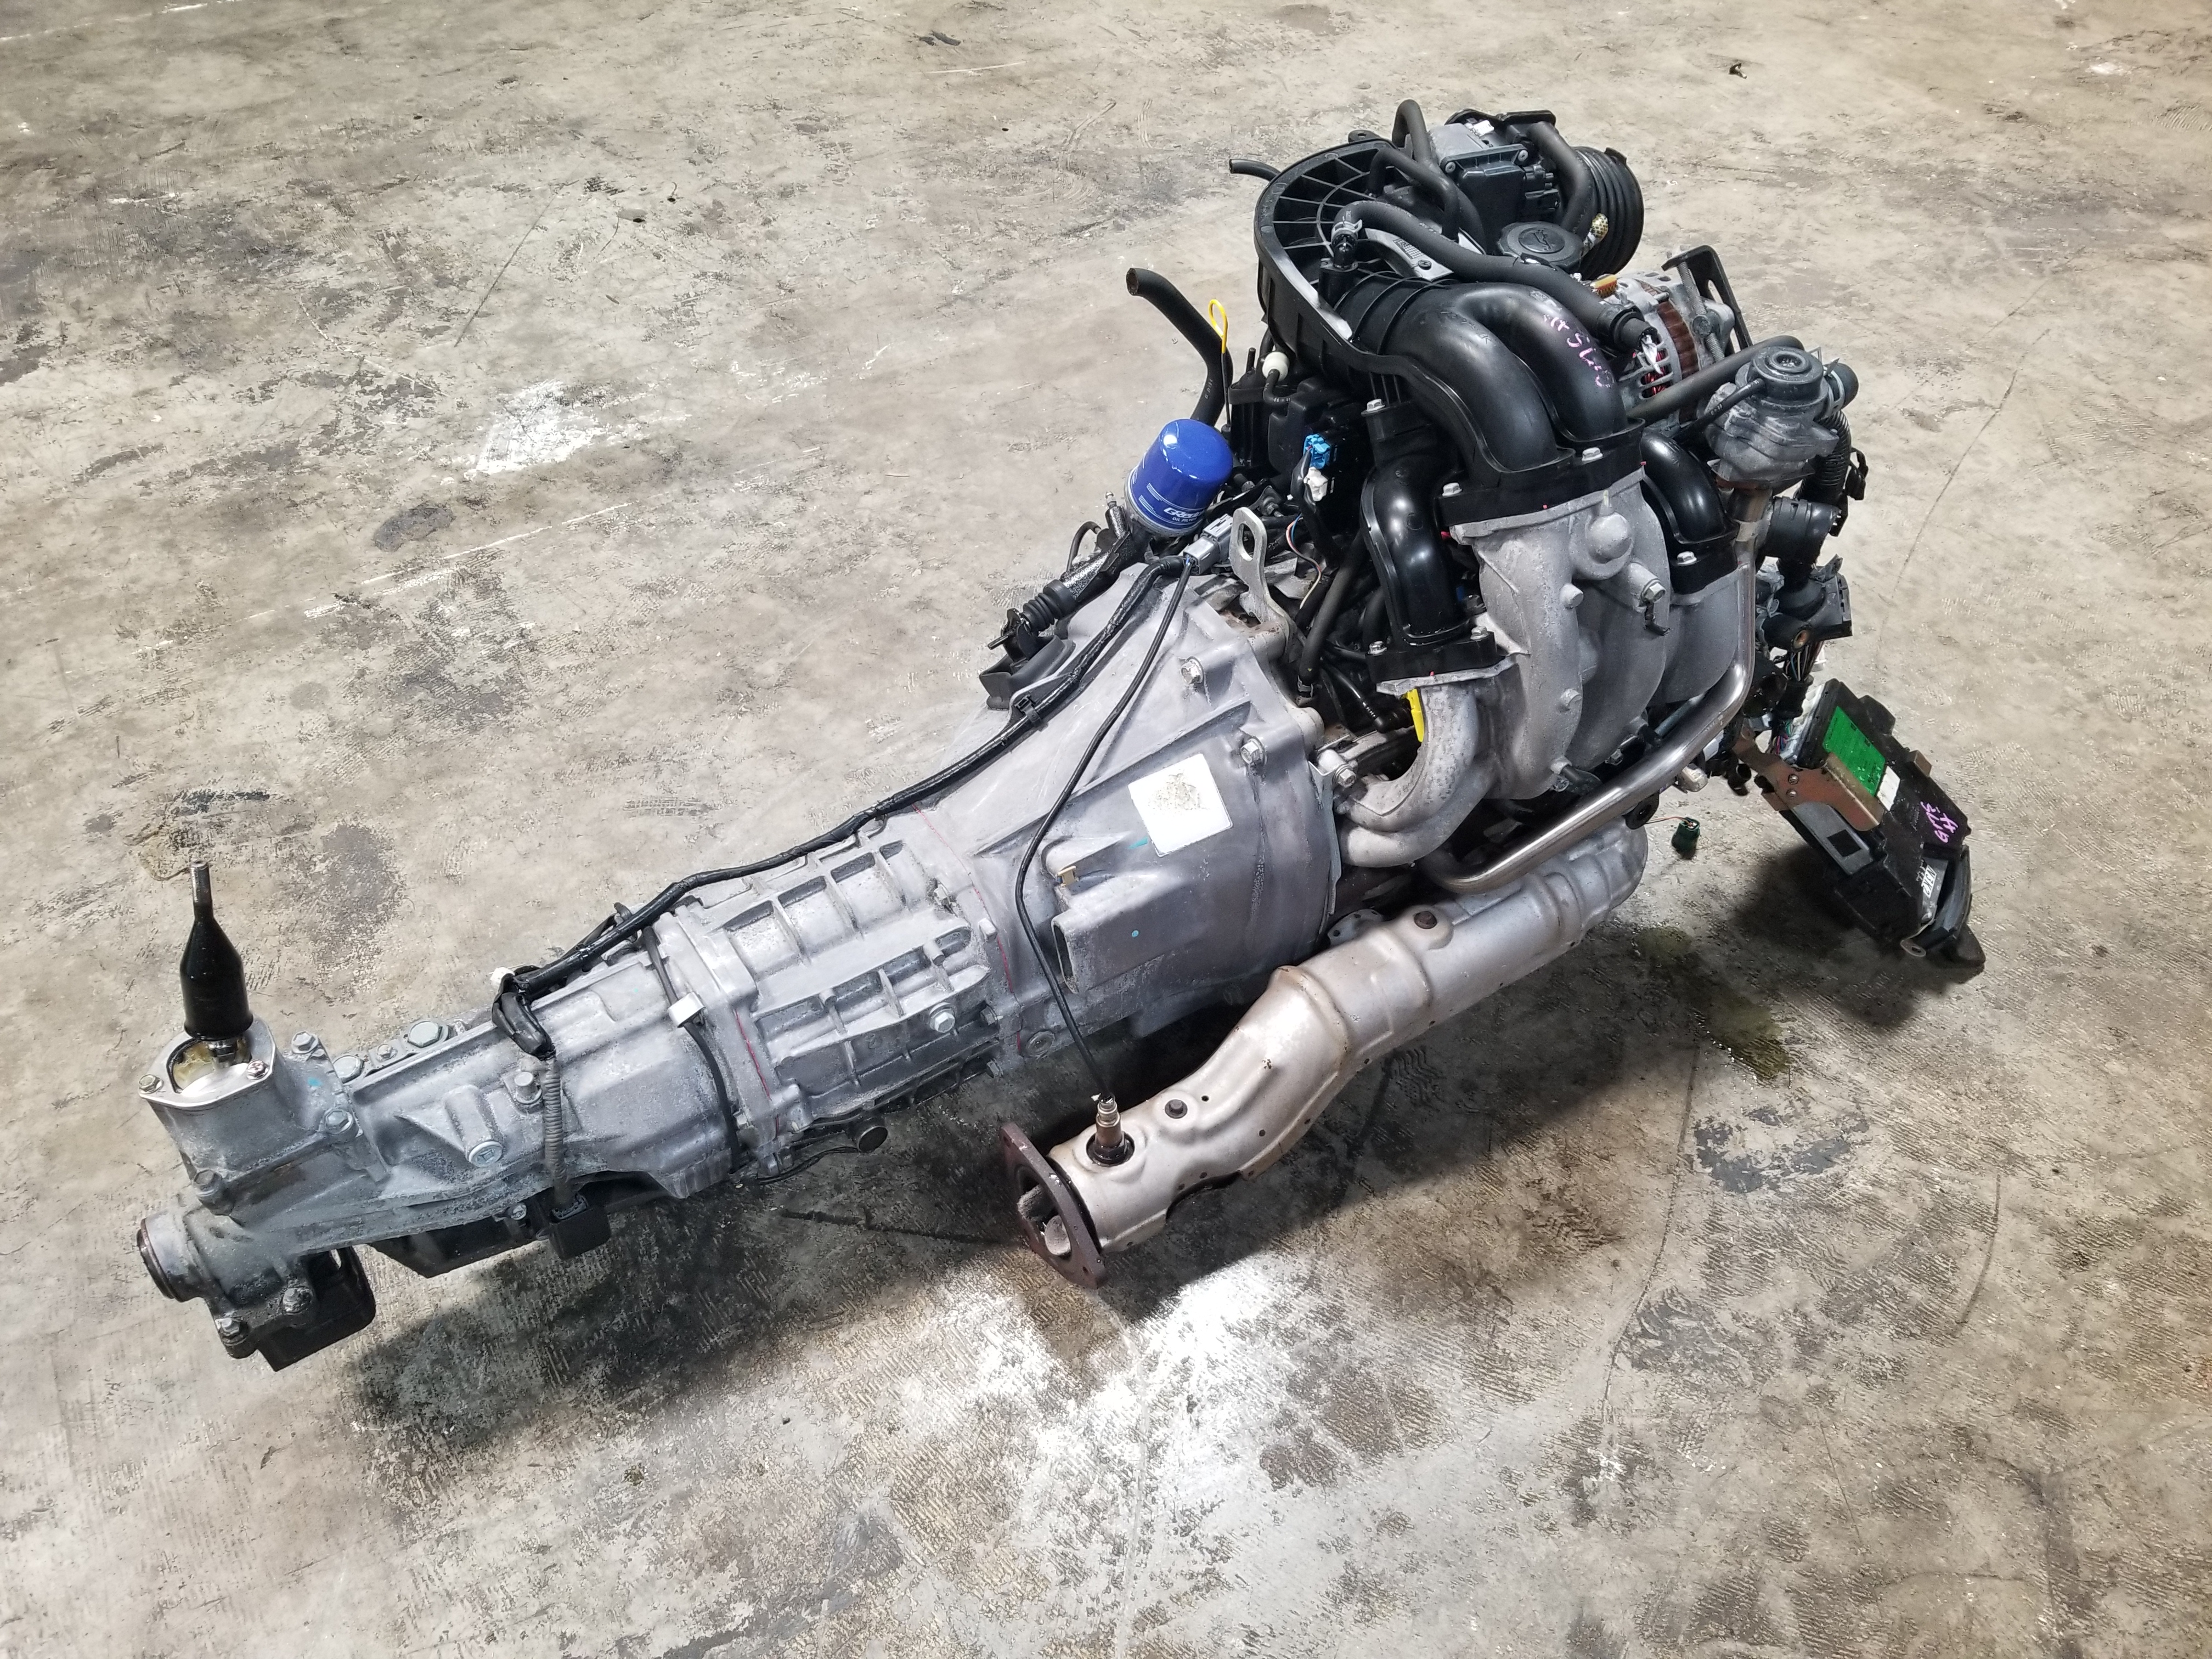 RX8 Mazda 13B 6 Port Renesis 1 3L Rotary Engine Swap 6 Speed Manual ECU MT  Motor